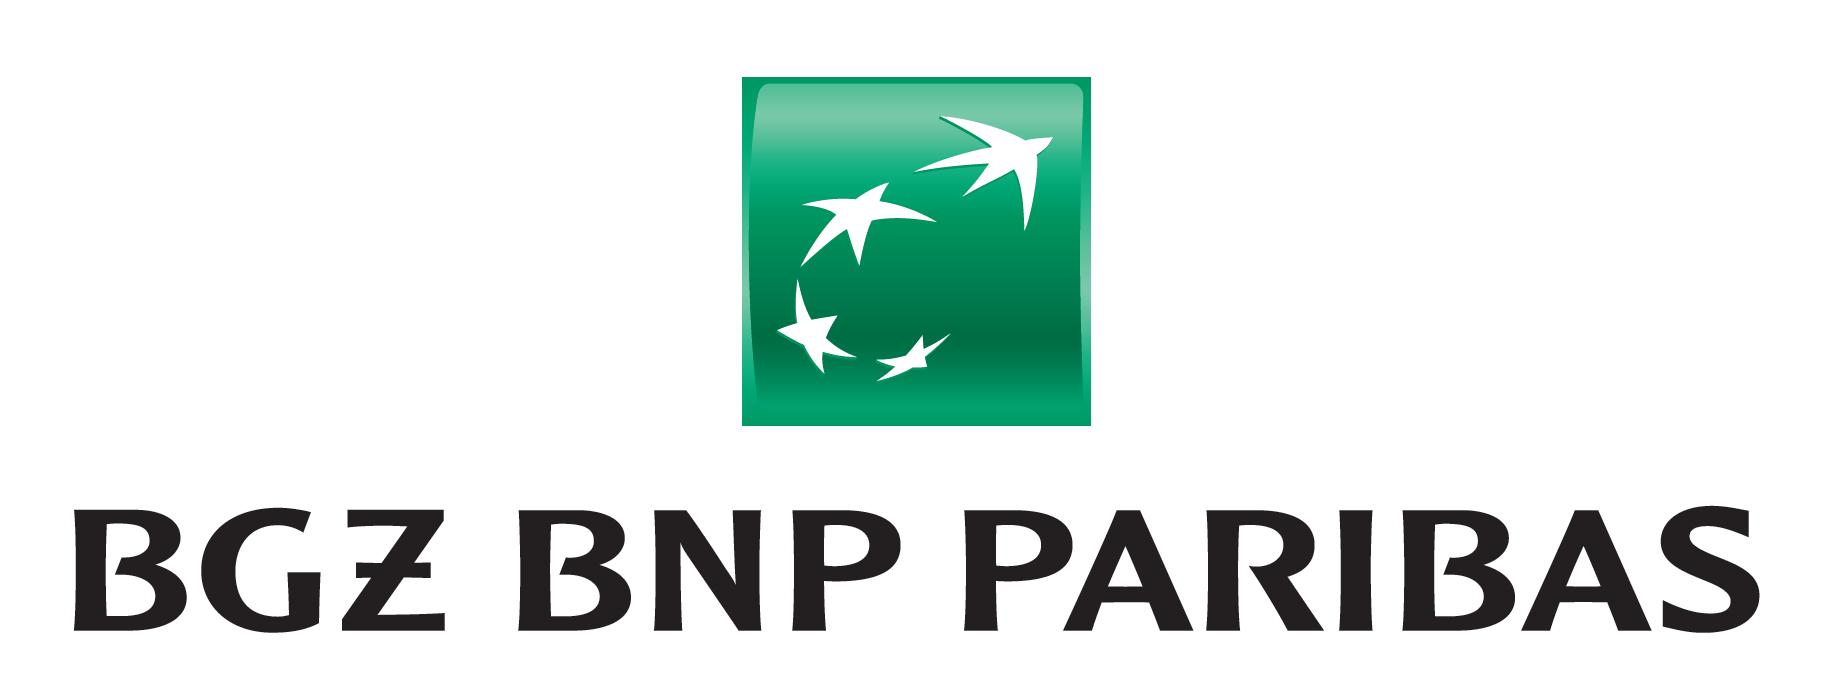 bgz-paribas